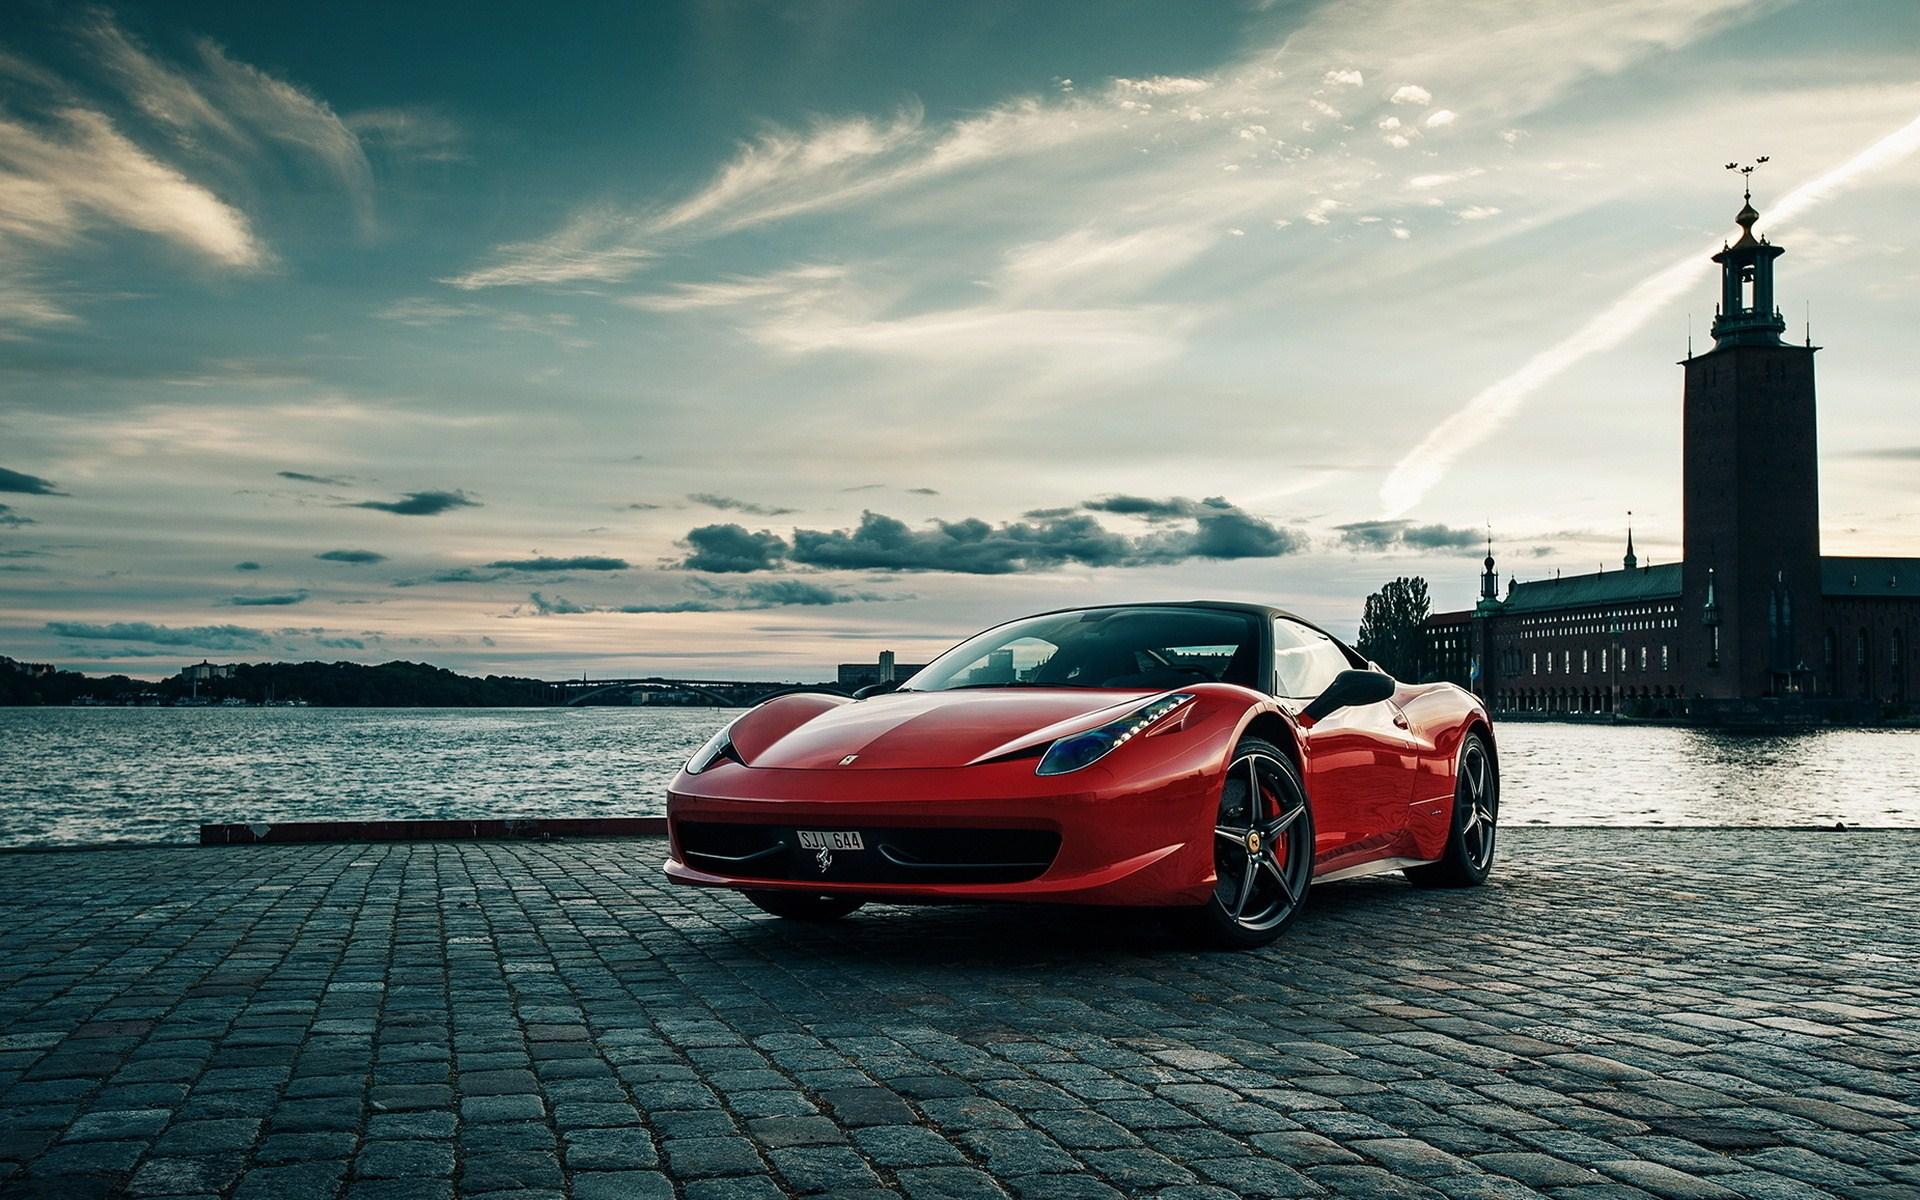 Ferrari 458 Wallpaper 04